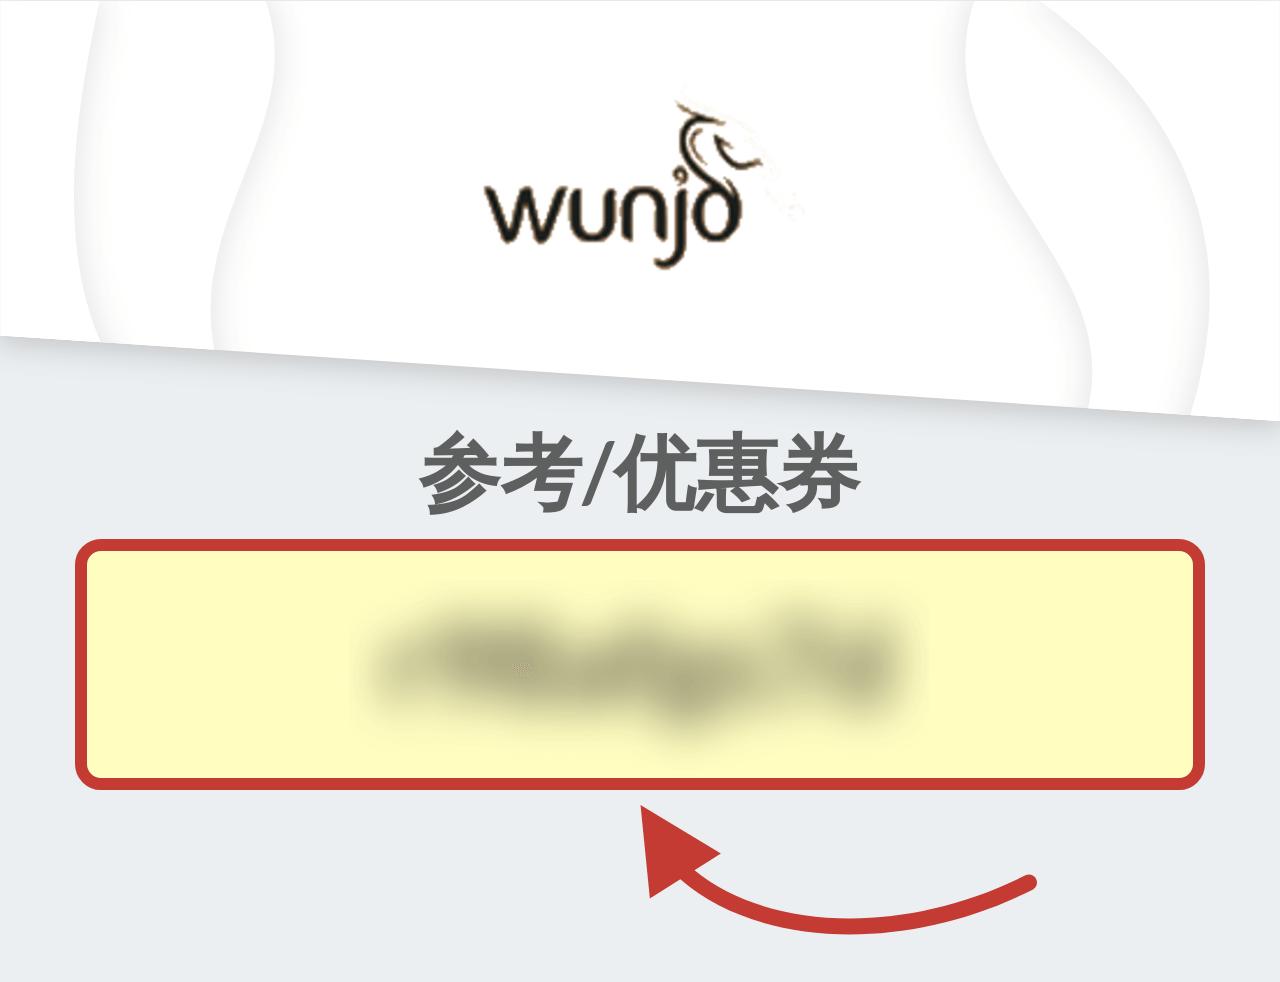 Wunjo-8 赌场优惠券代码